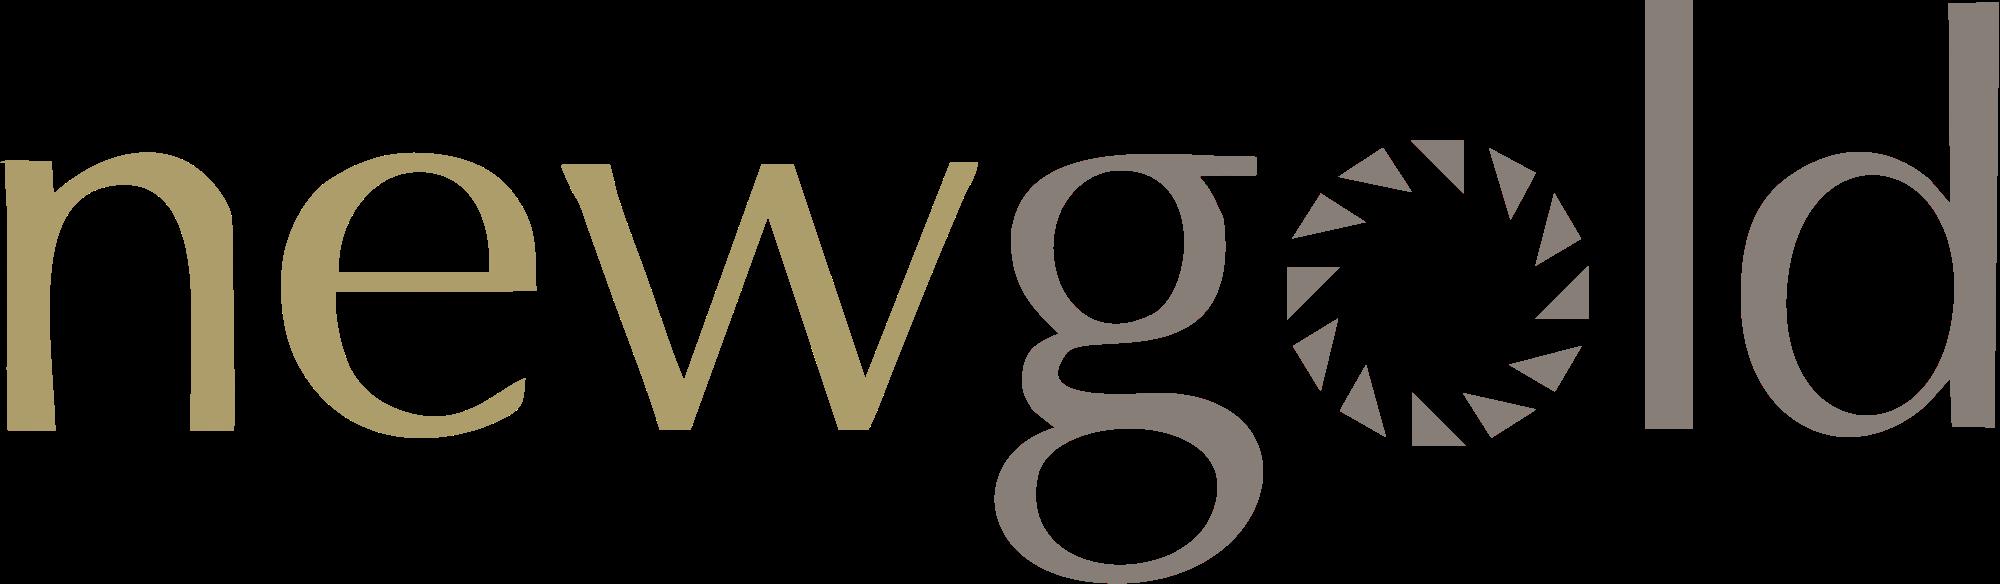 8 - New Gold Logo